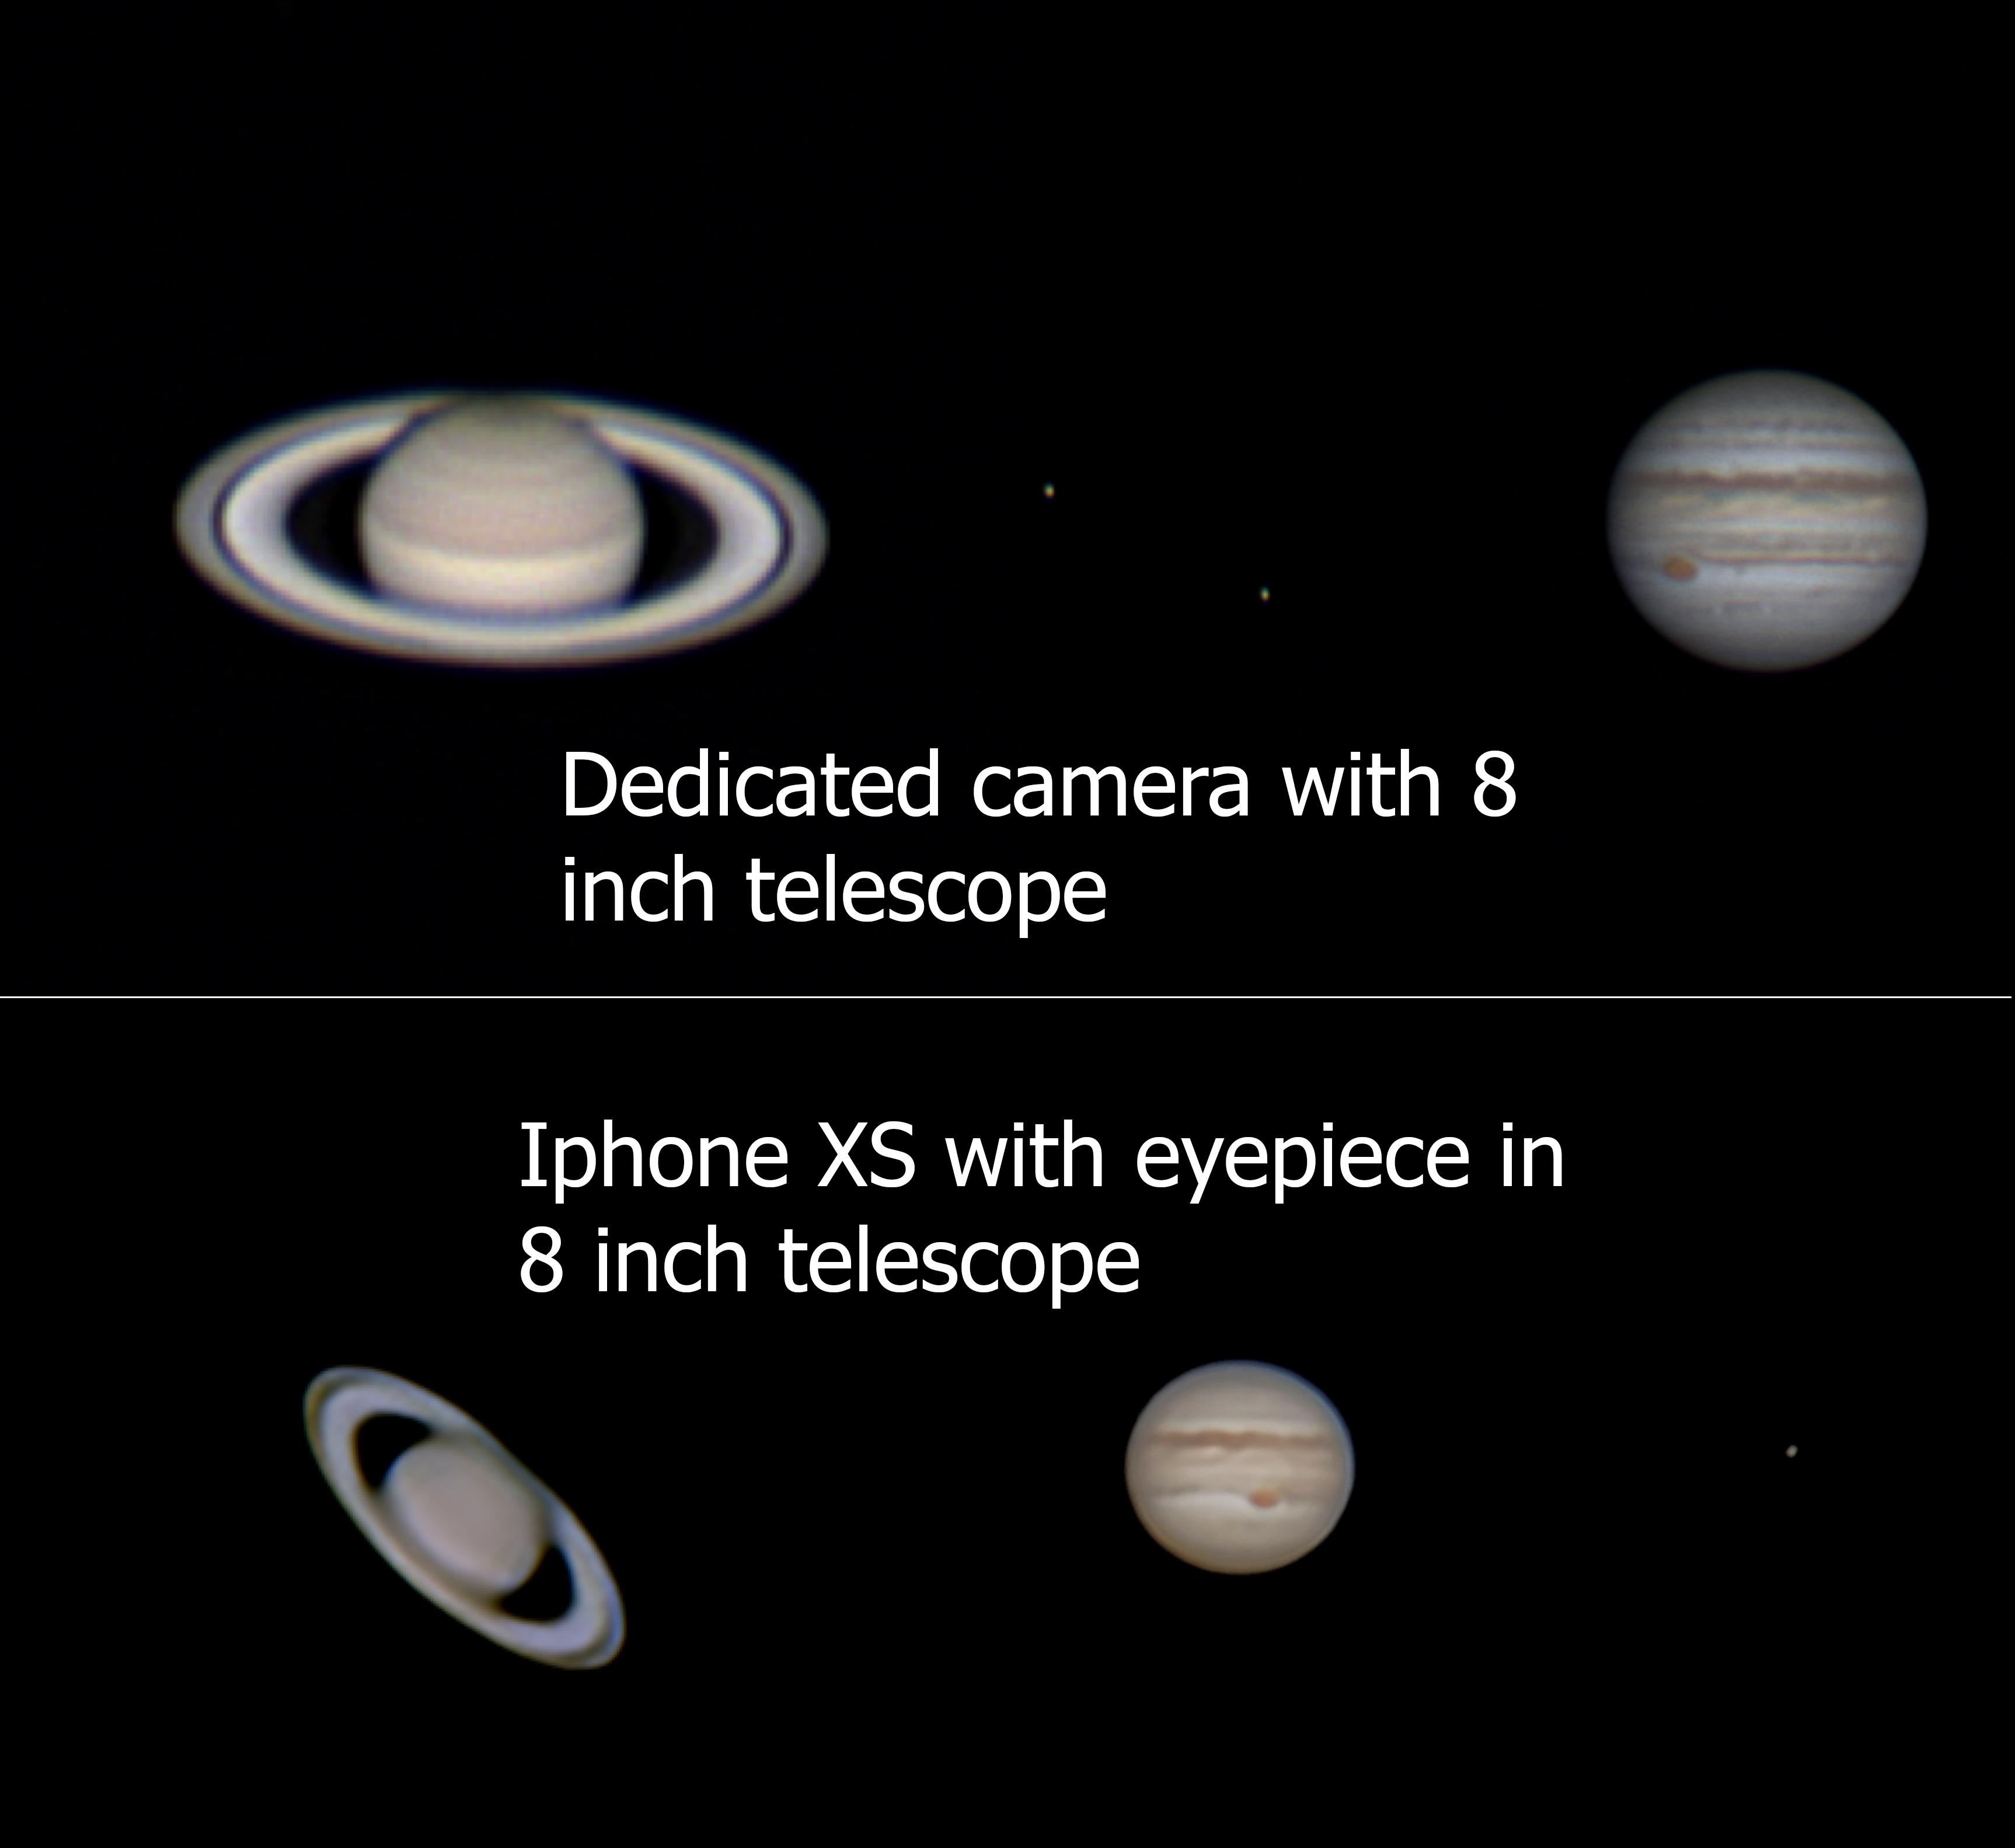 Jupiter And Saturn Shot On Iphone Vs Planetary Camera Saturn Planetary Planetary Science